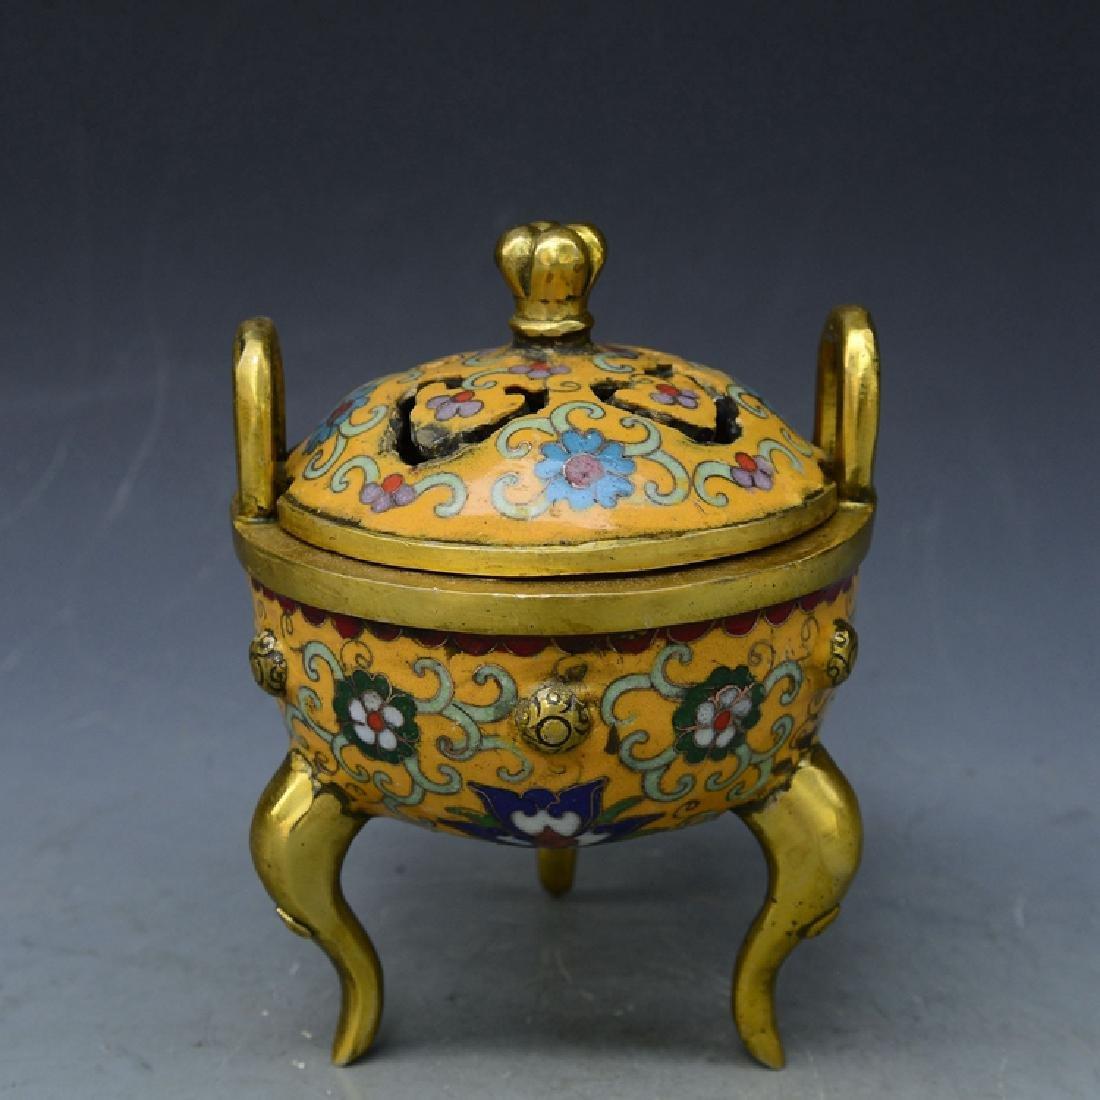 Chinese Antique Jingdezhen Yellow Glaze Porcelain